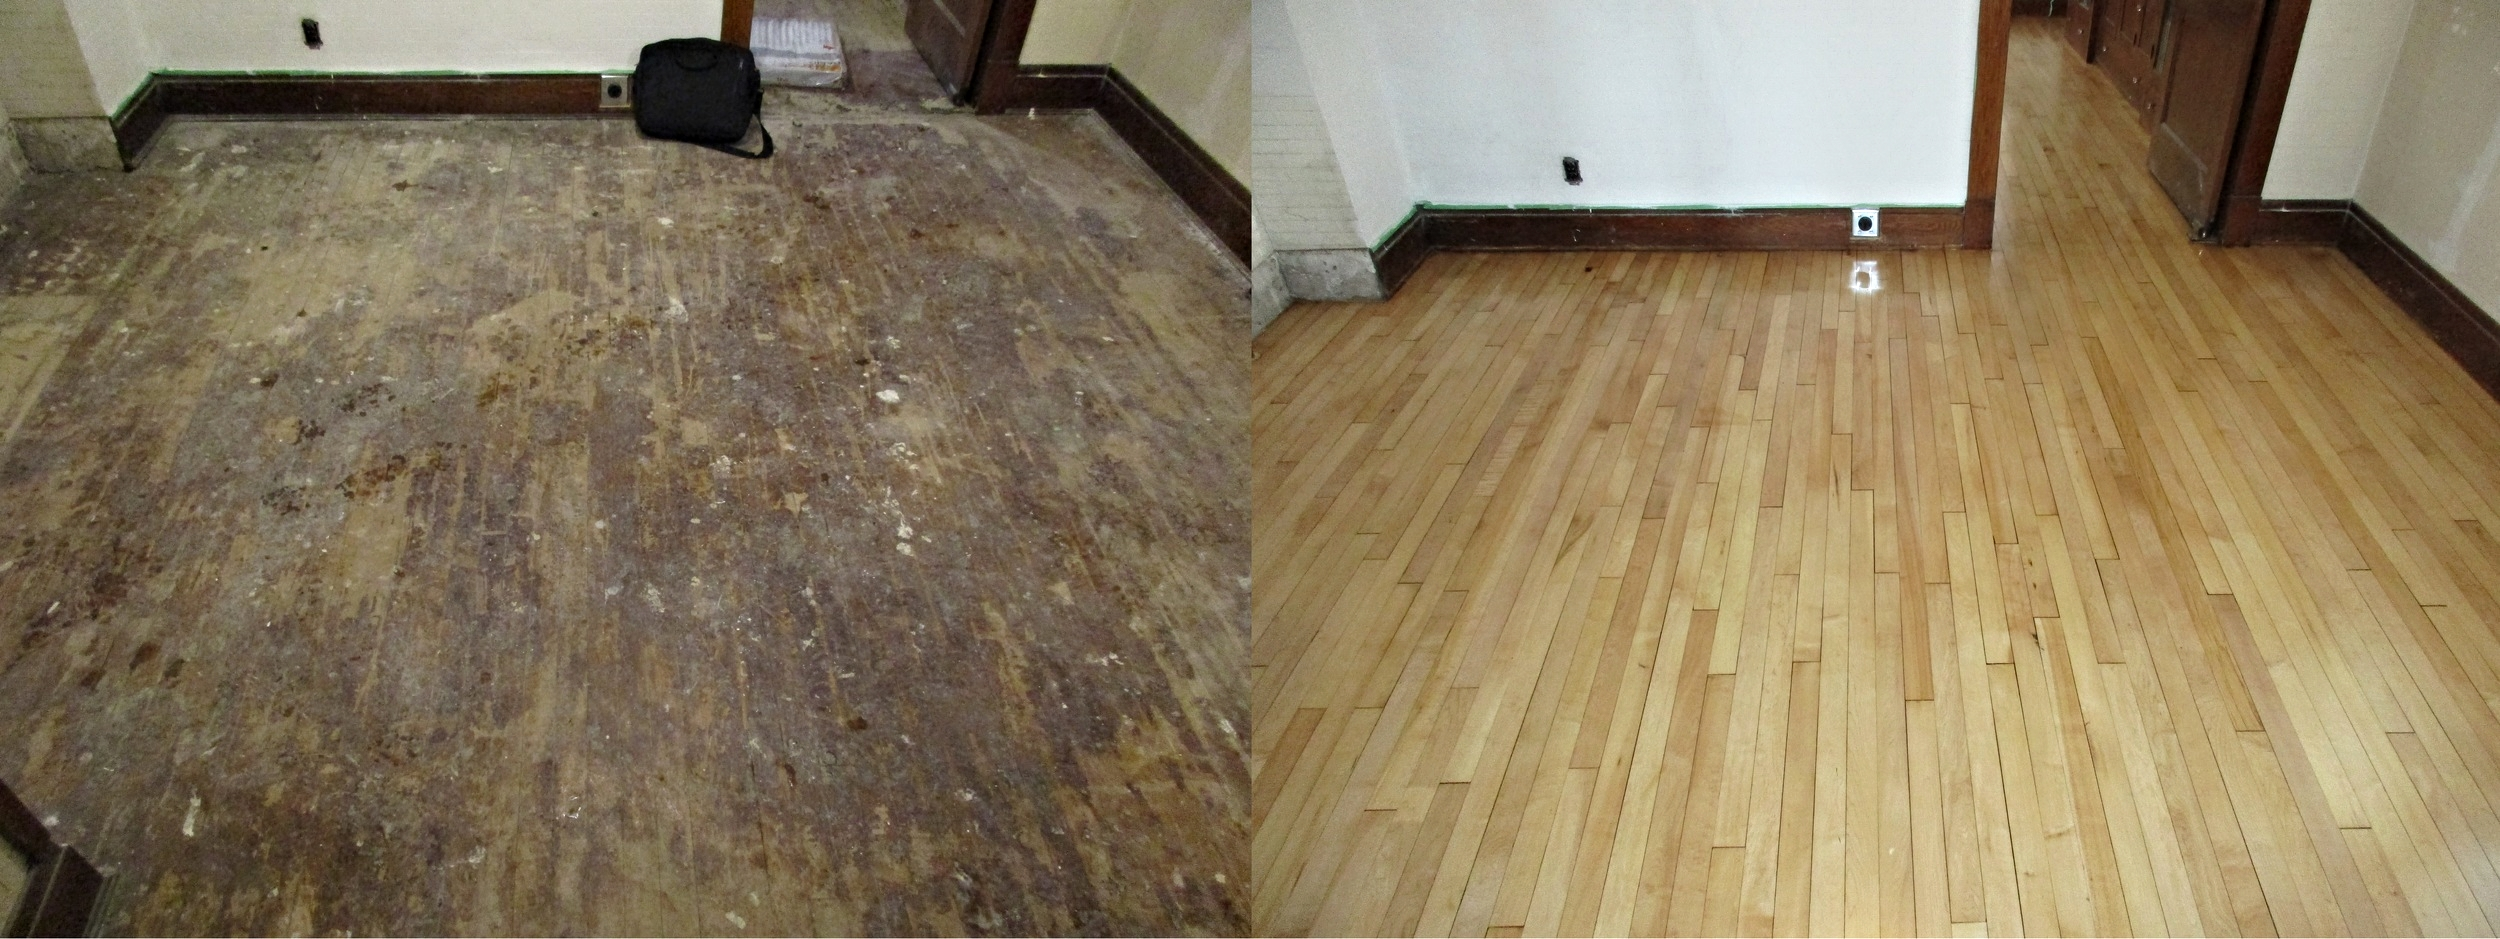 Wood Floor Refinishing Sand Stain